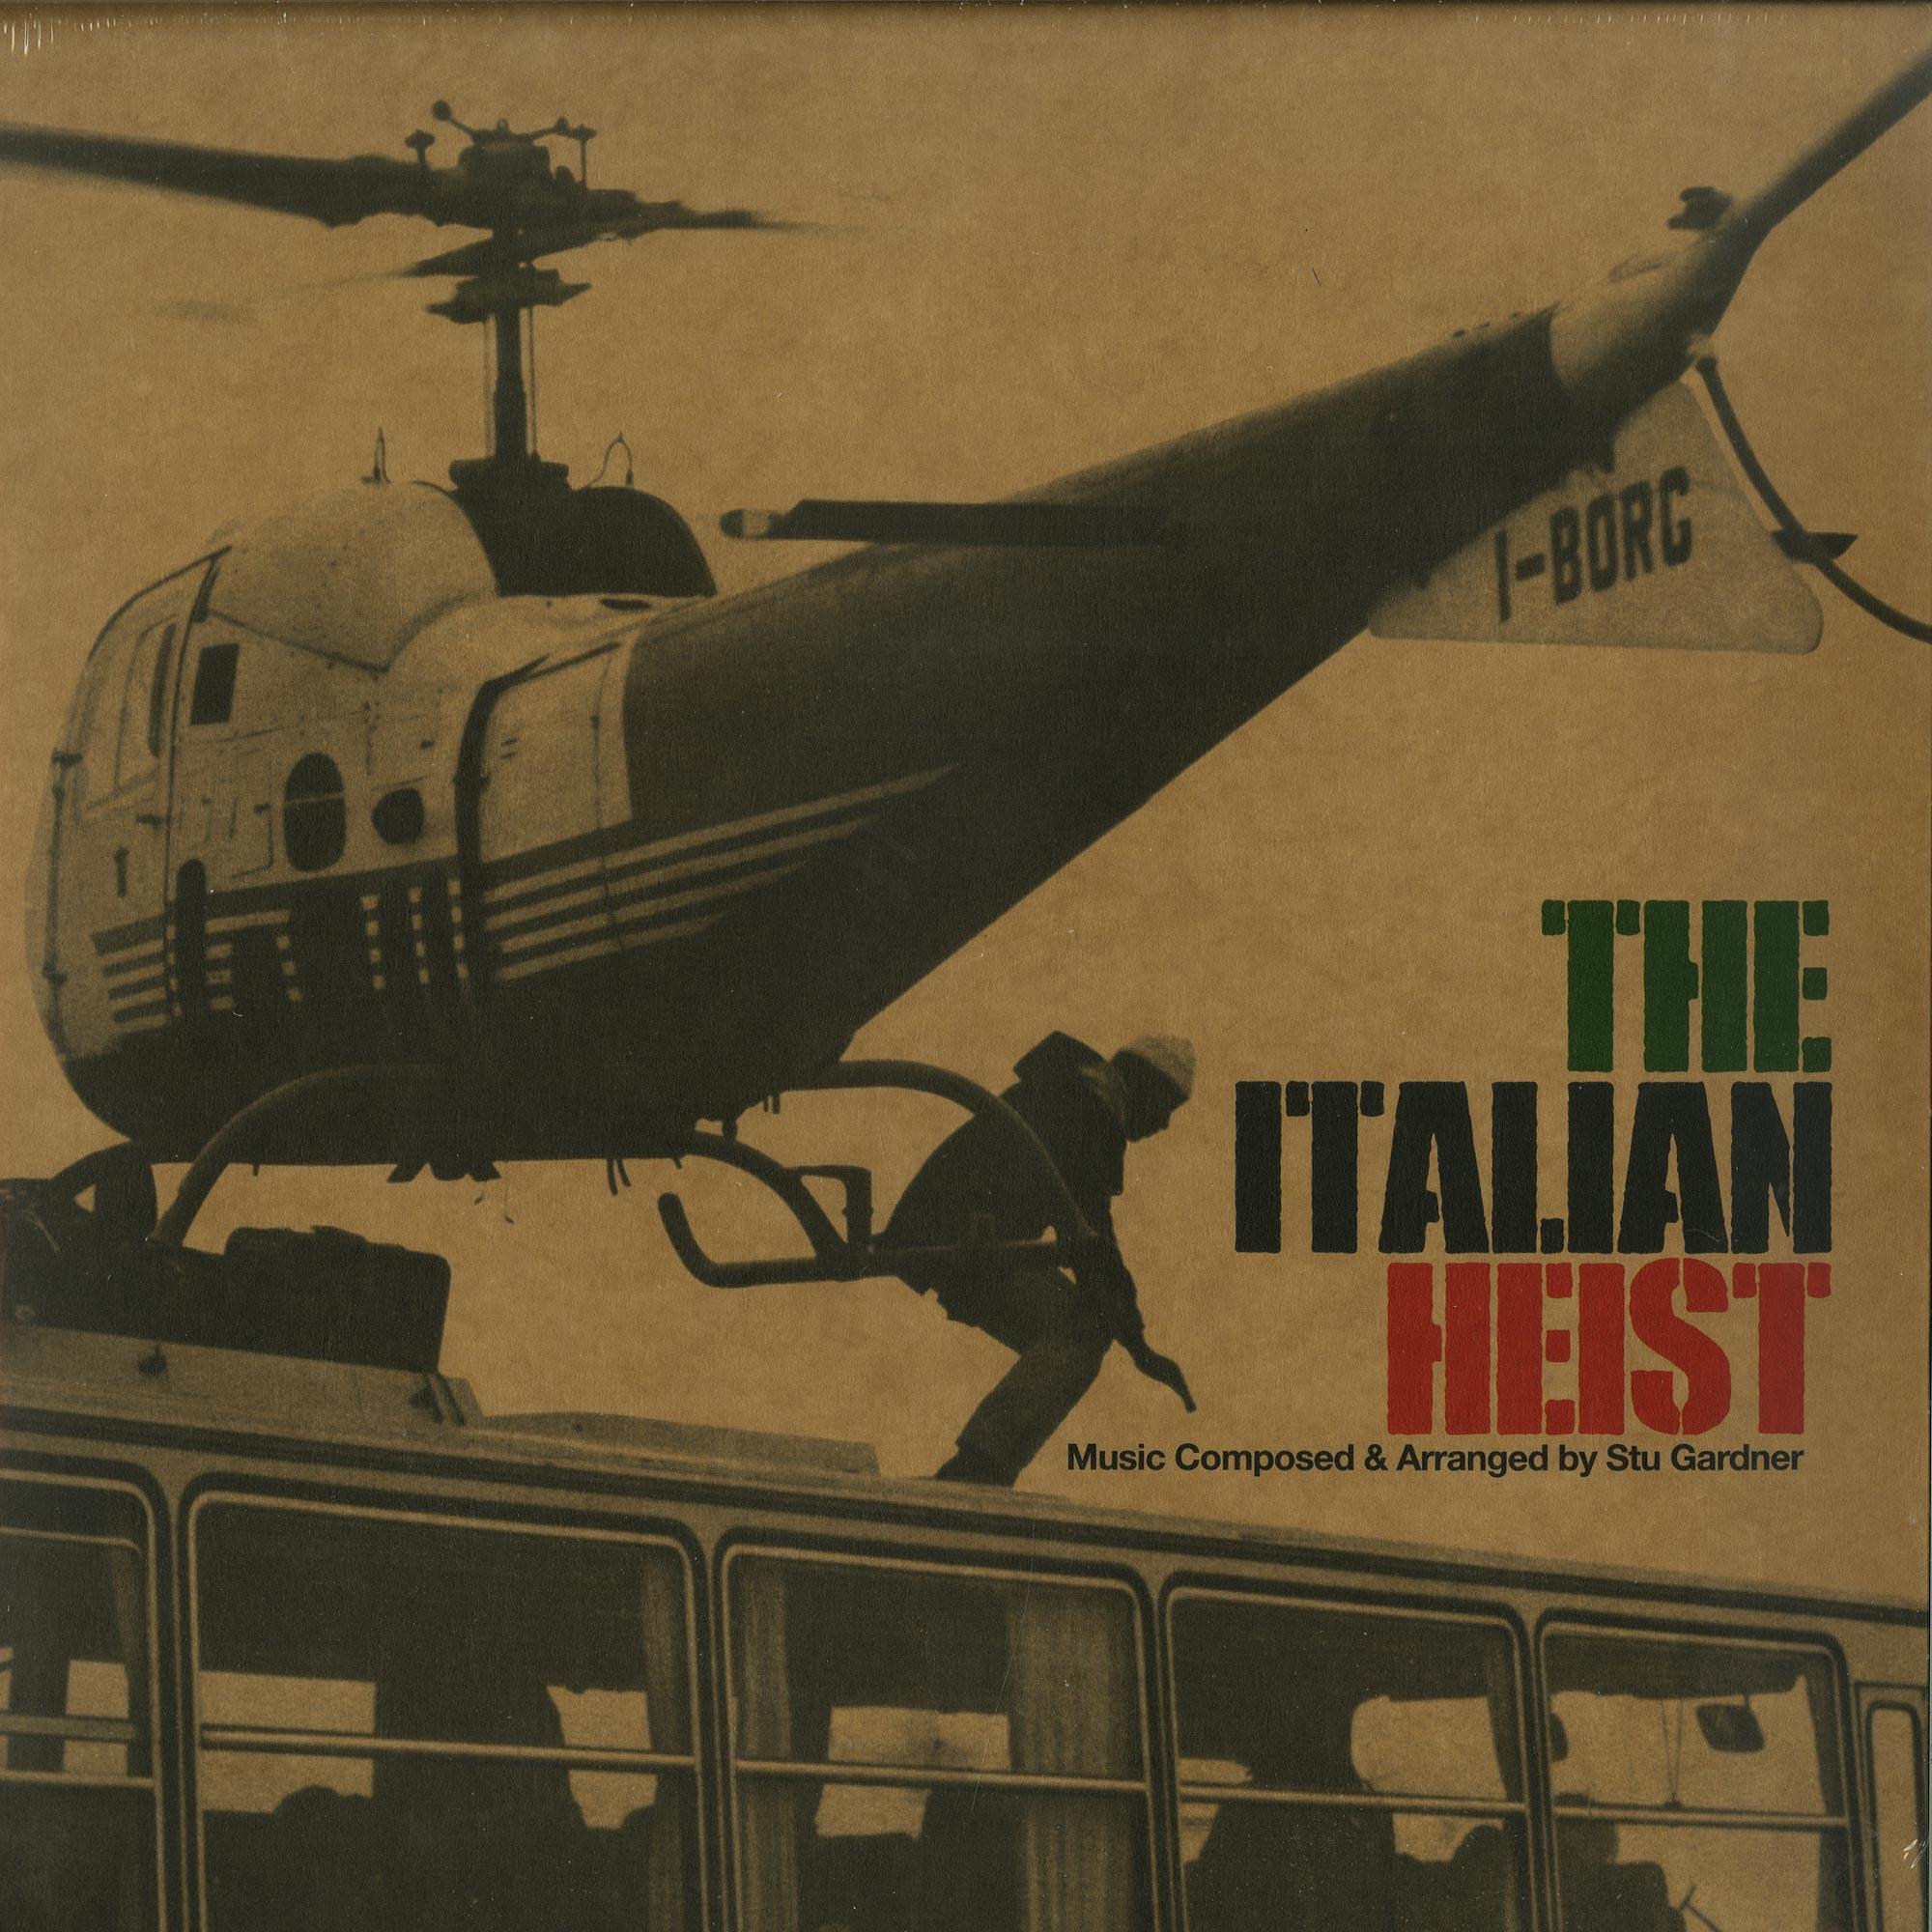 Stu Gardner - THE ITALIAN HEIST